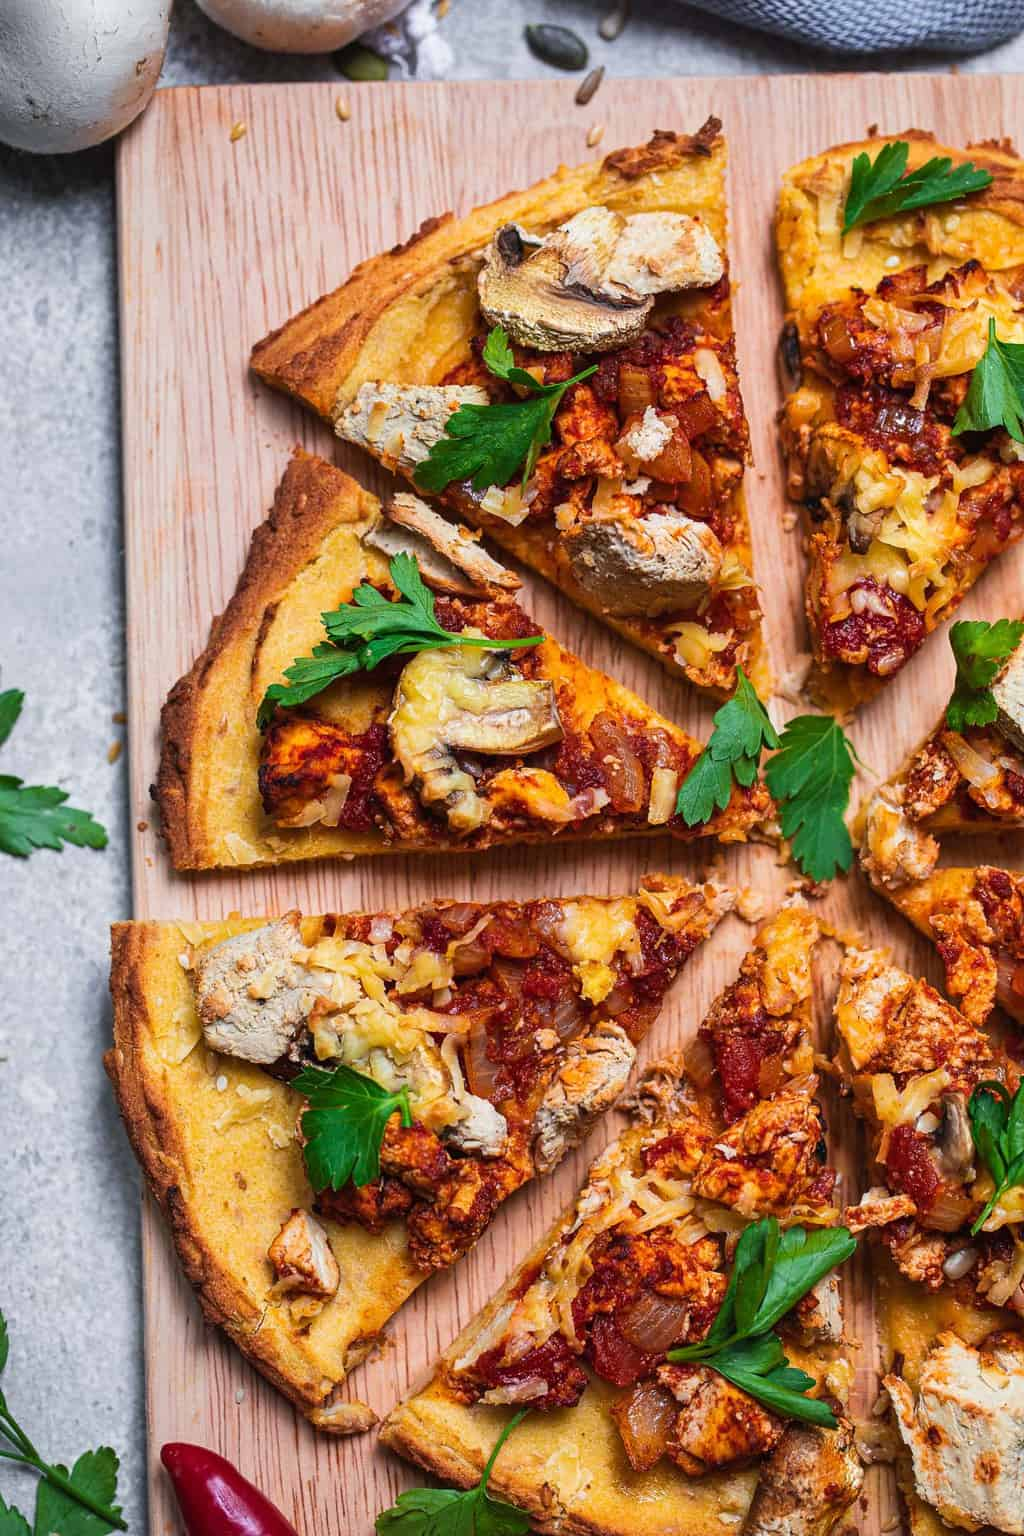 Gluten-free vegan pizza with mushrooms and tofu